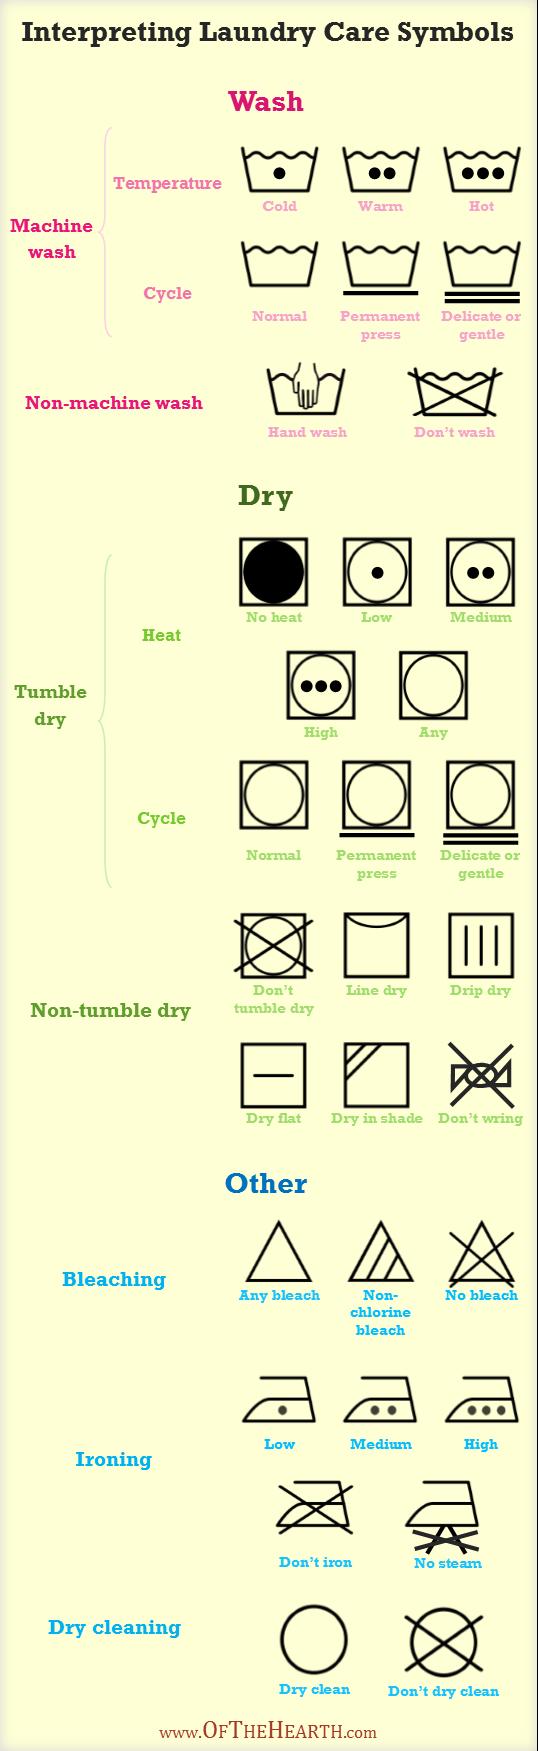 Interpreting Laundry Care Symbols Keeping The Home Pinterest